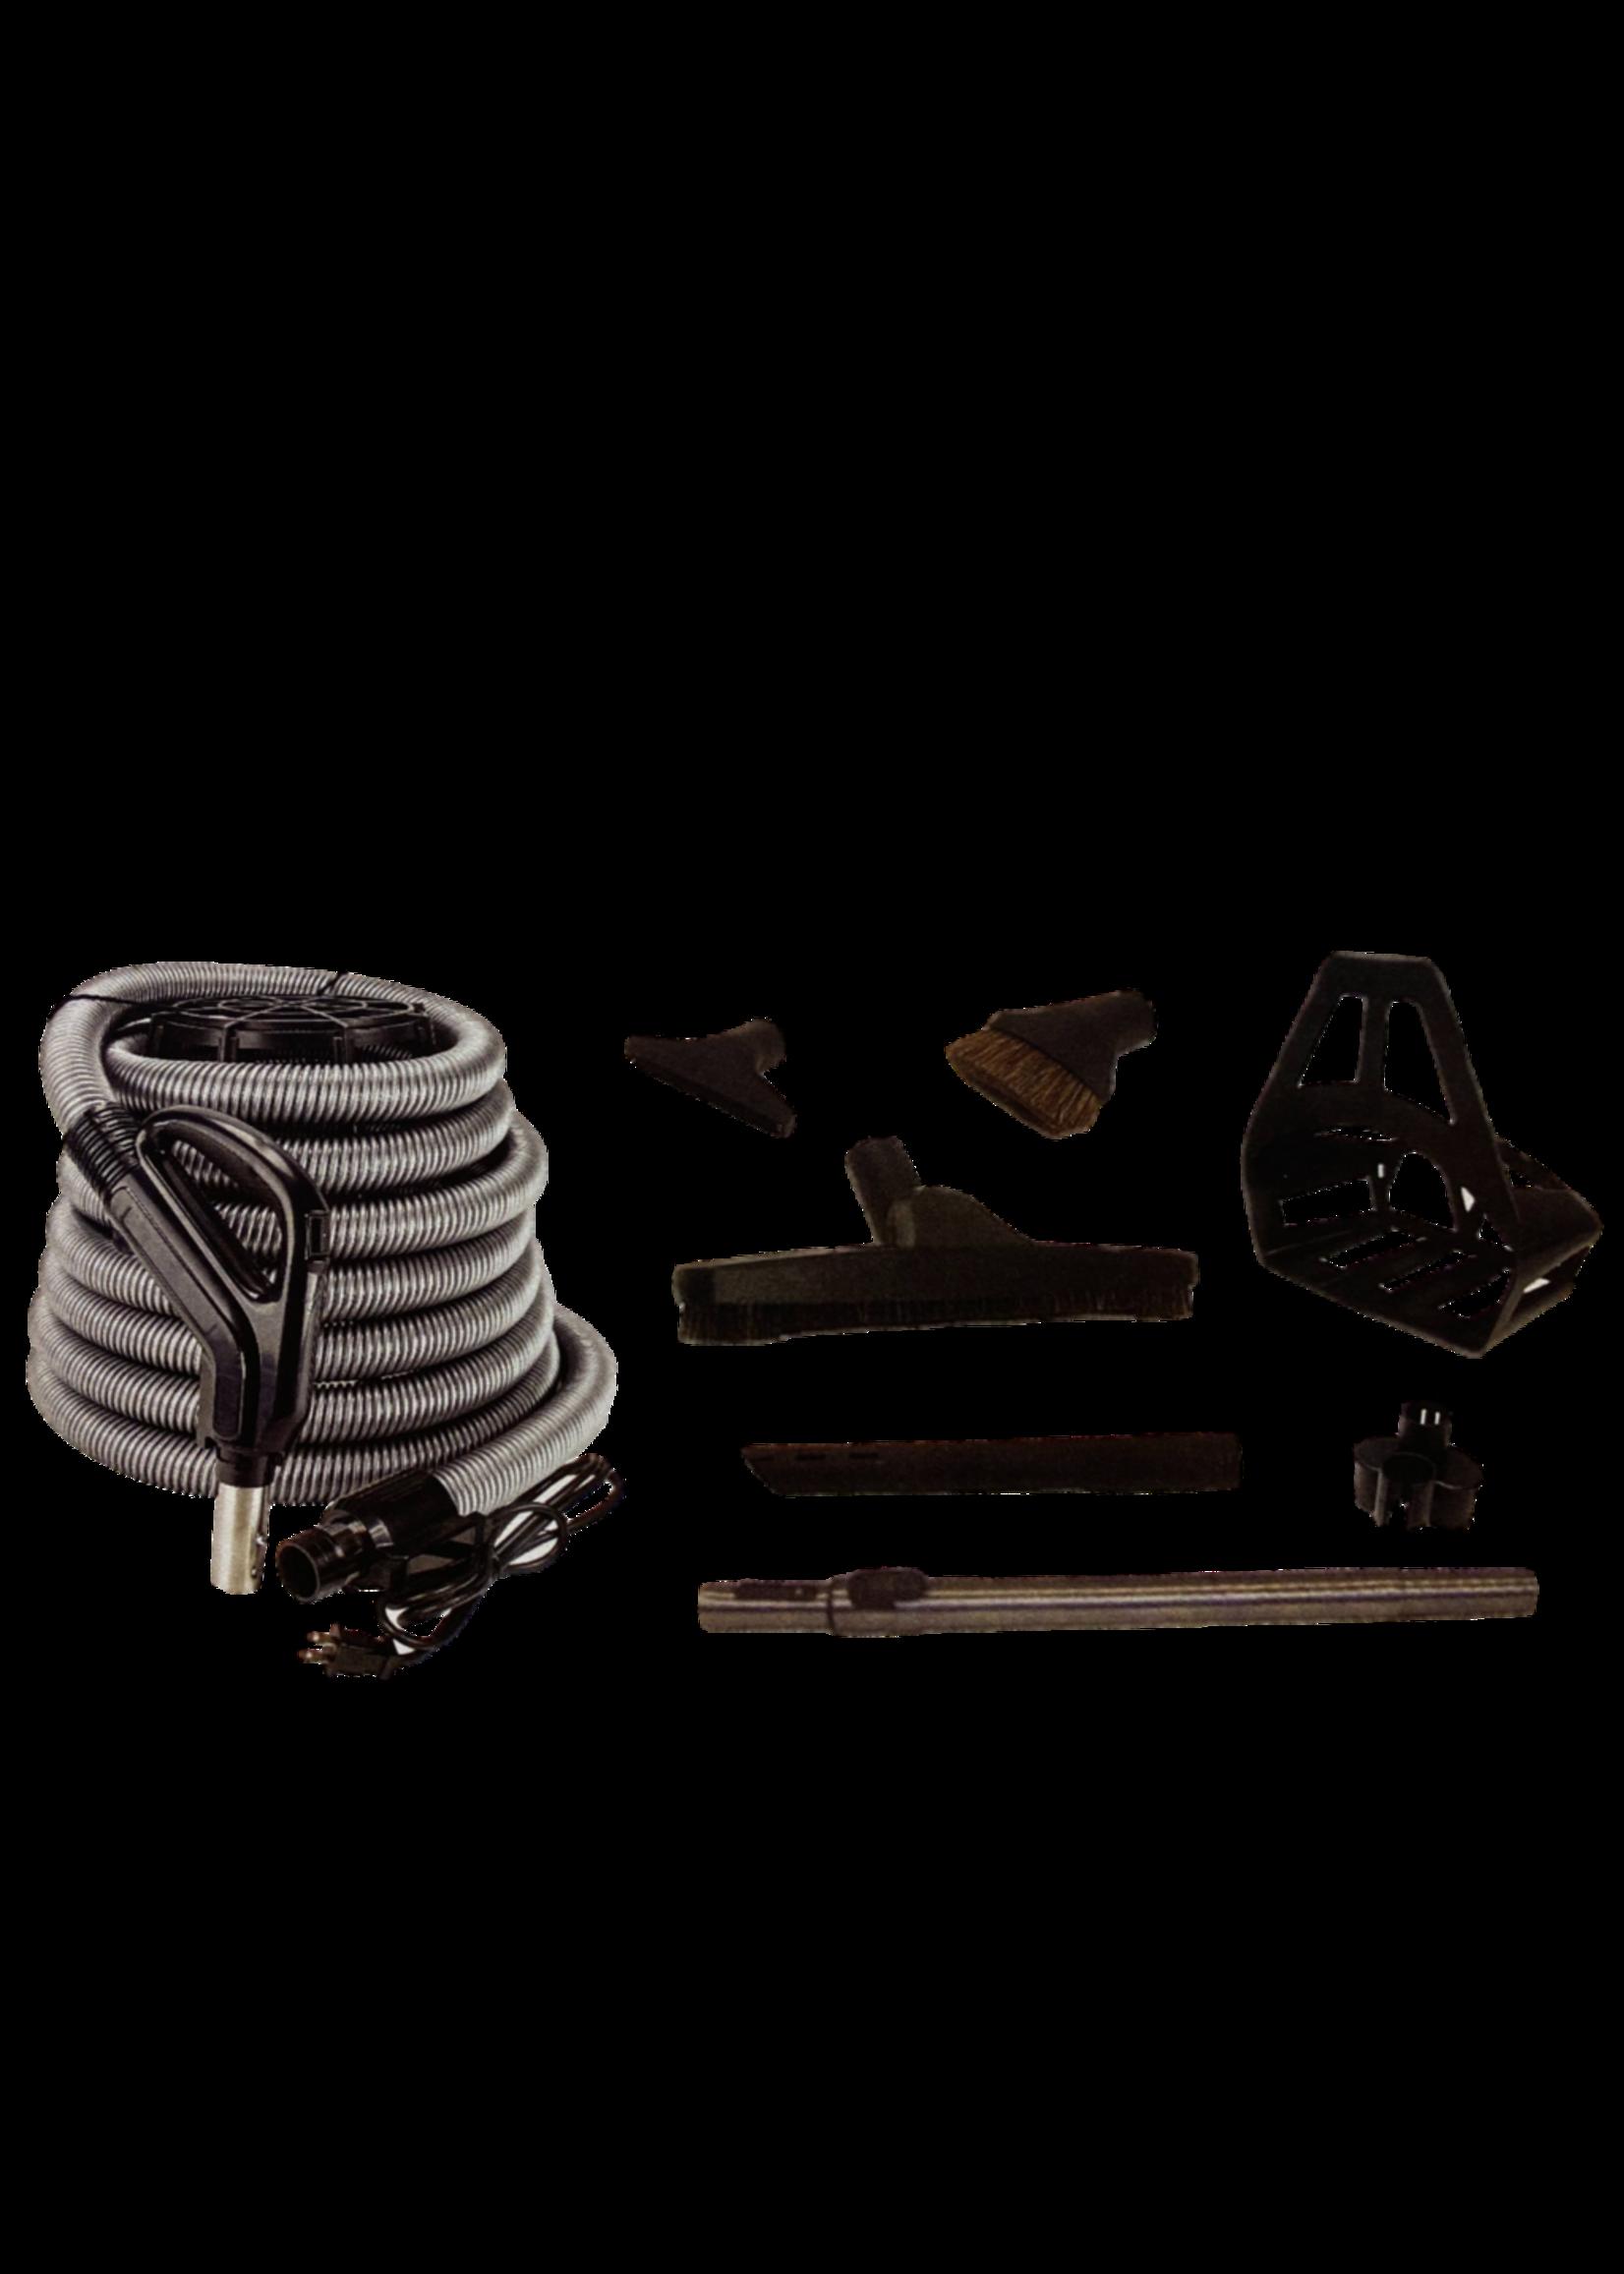 Cana Vac Dual Voltage Hose Kit - VWDVKIT30